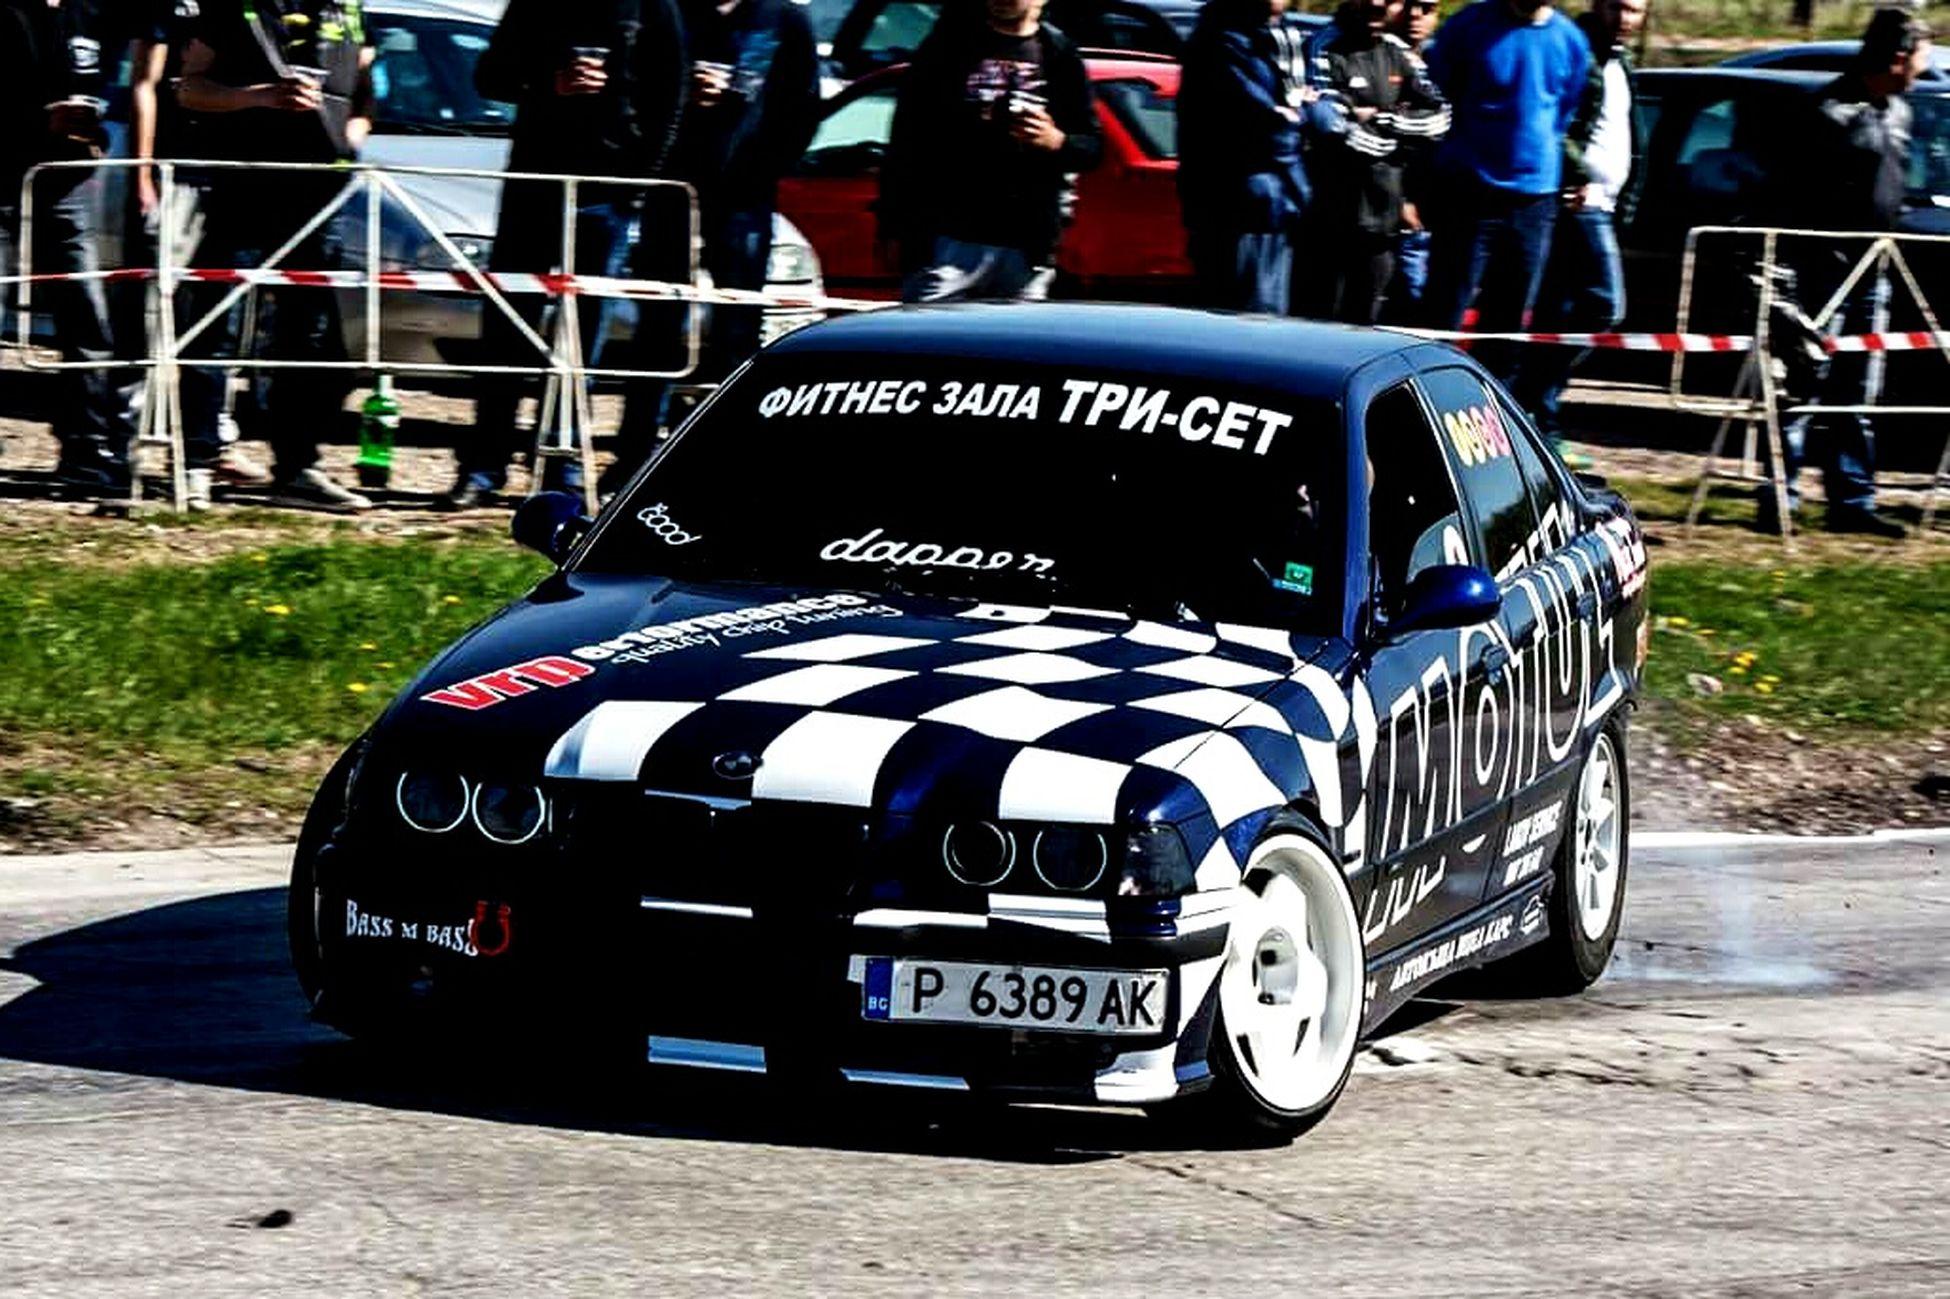 Bmw E36 Bmw I ♥ It Bmw Drift BMW Race Drifting Low Rider  Ruse Bulgaria BMW 325i Outdoors Bmw Car No People Day Sunday BMW!!! BMW E36 Drift Bmw Club Bulgaria Bułgaria Standing Motorsportphotography Car Bmwmotorsport